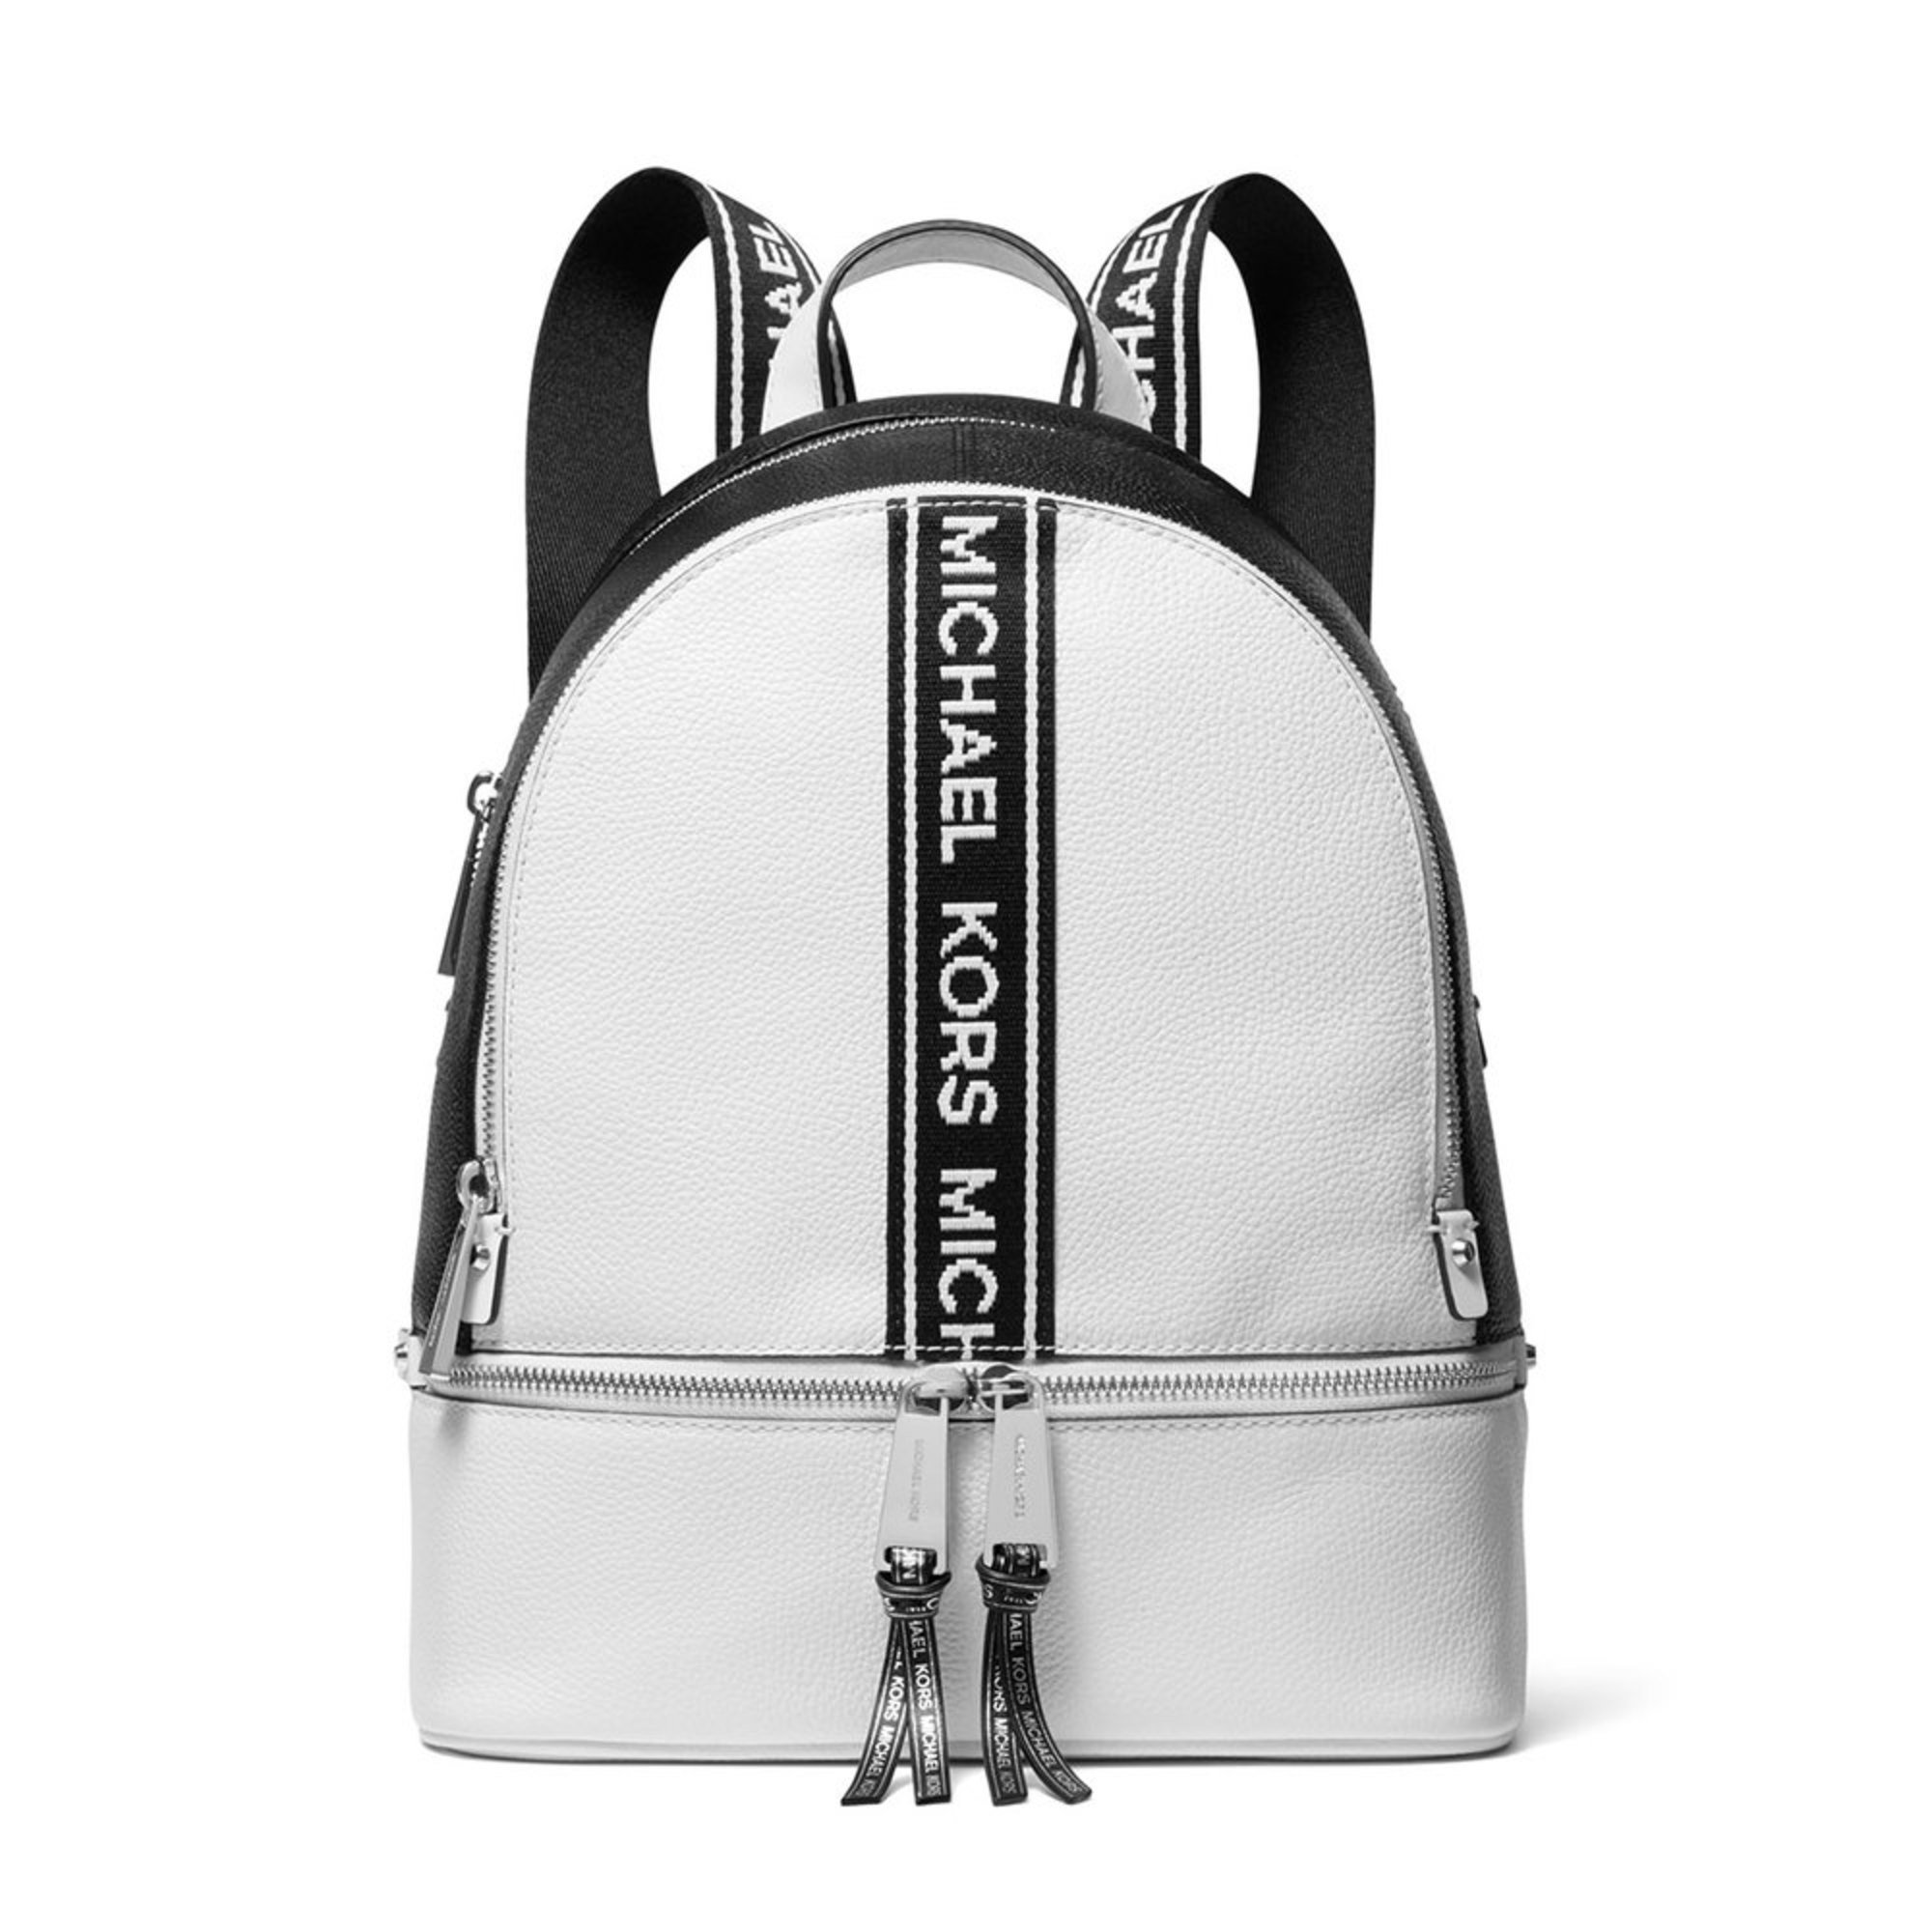 9cb62341272a Michael Kors. Michael Kors Rhea Zip Medium Backpack